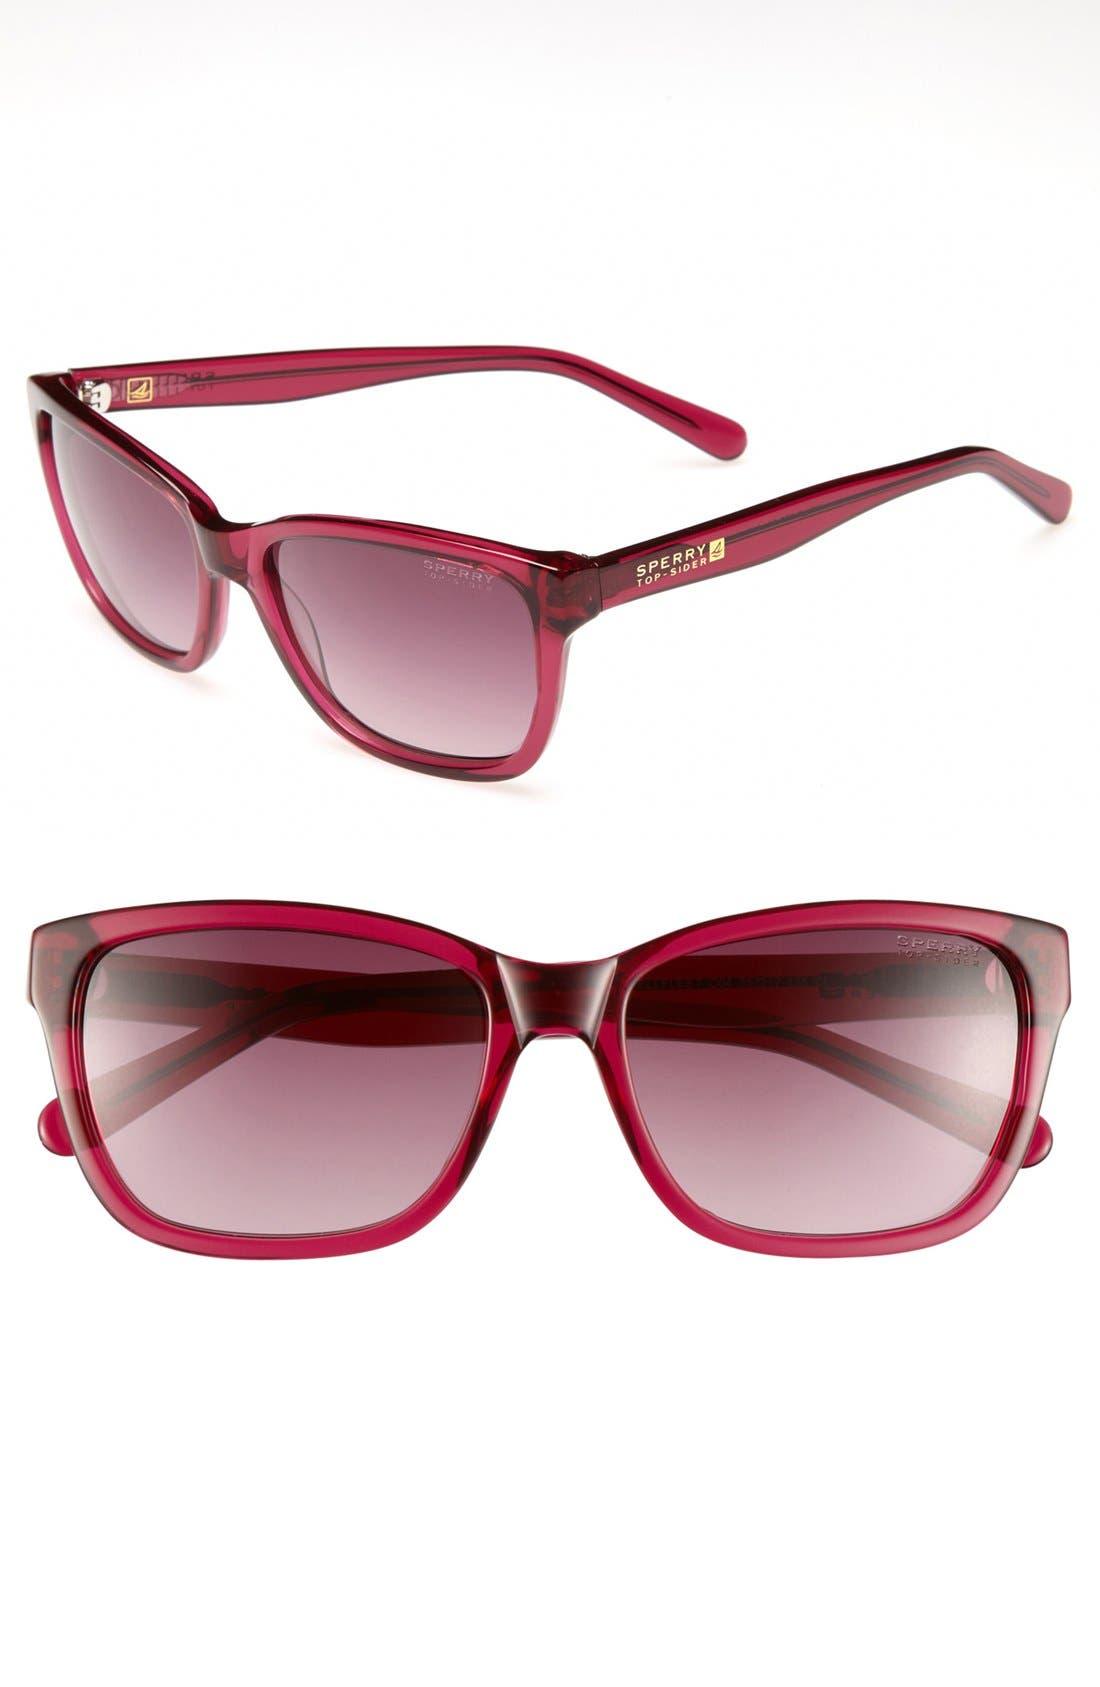 Alternate Image 1 Selected - Sperry Top-Sider® 'Wellfleet' 55mm Sunglasses (Online Only)